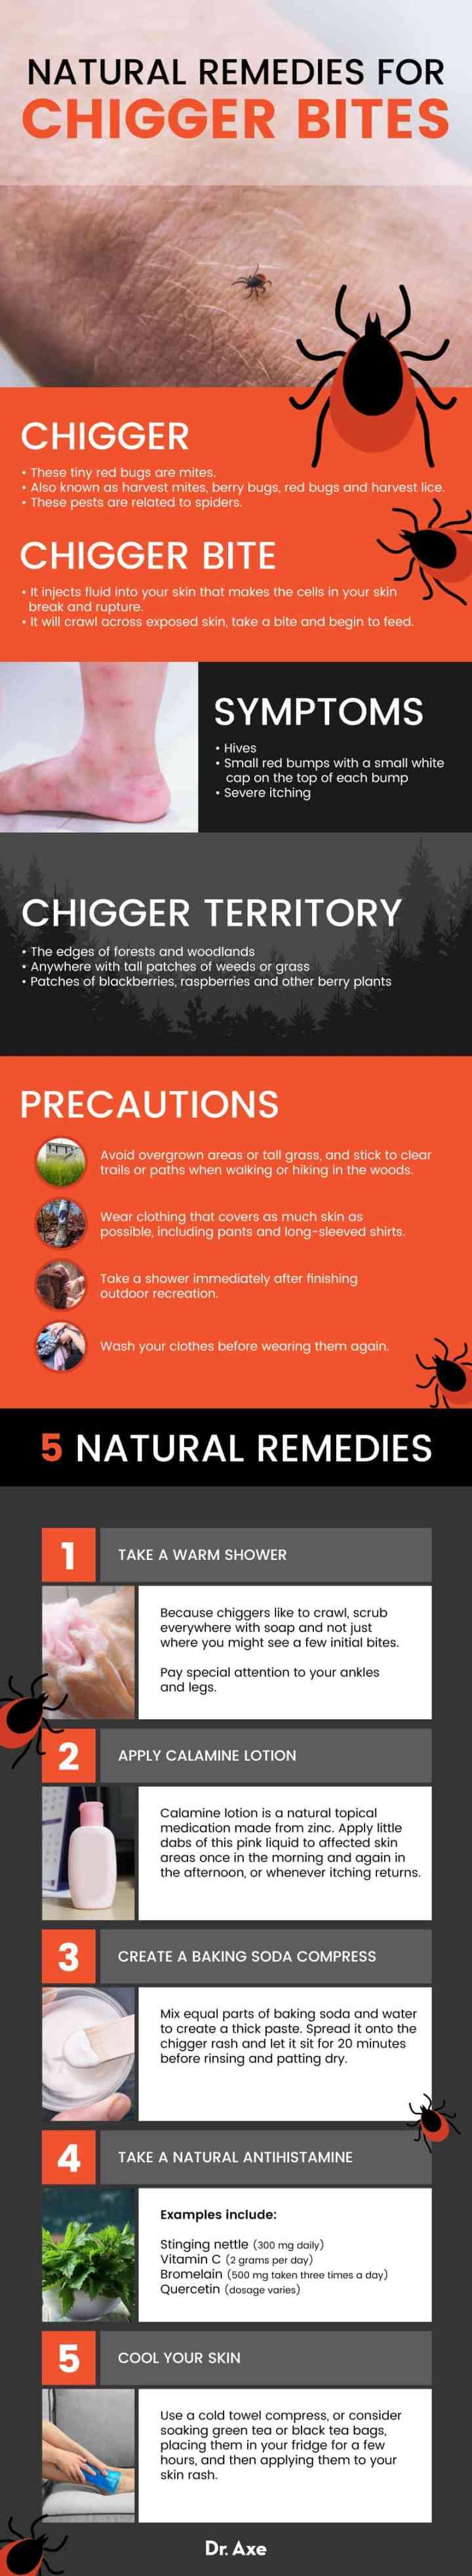 Chigger bites remedies